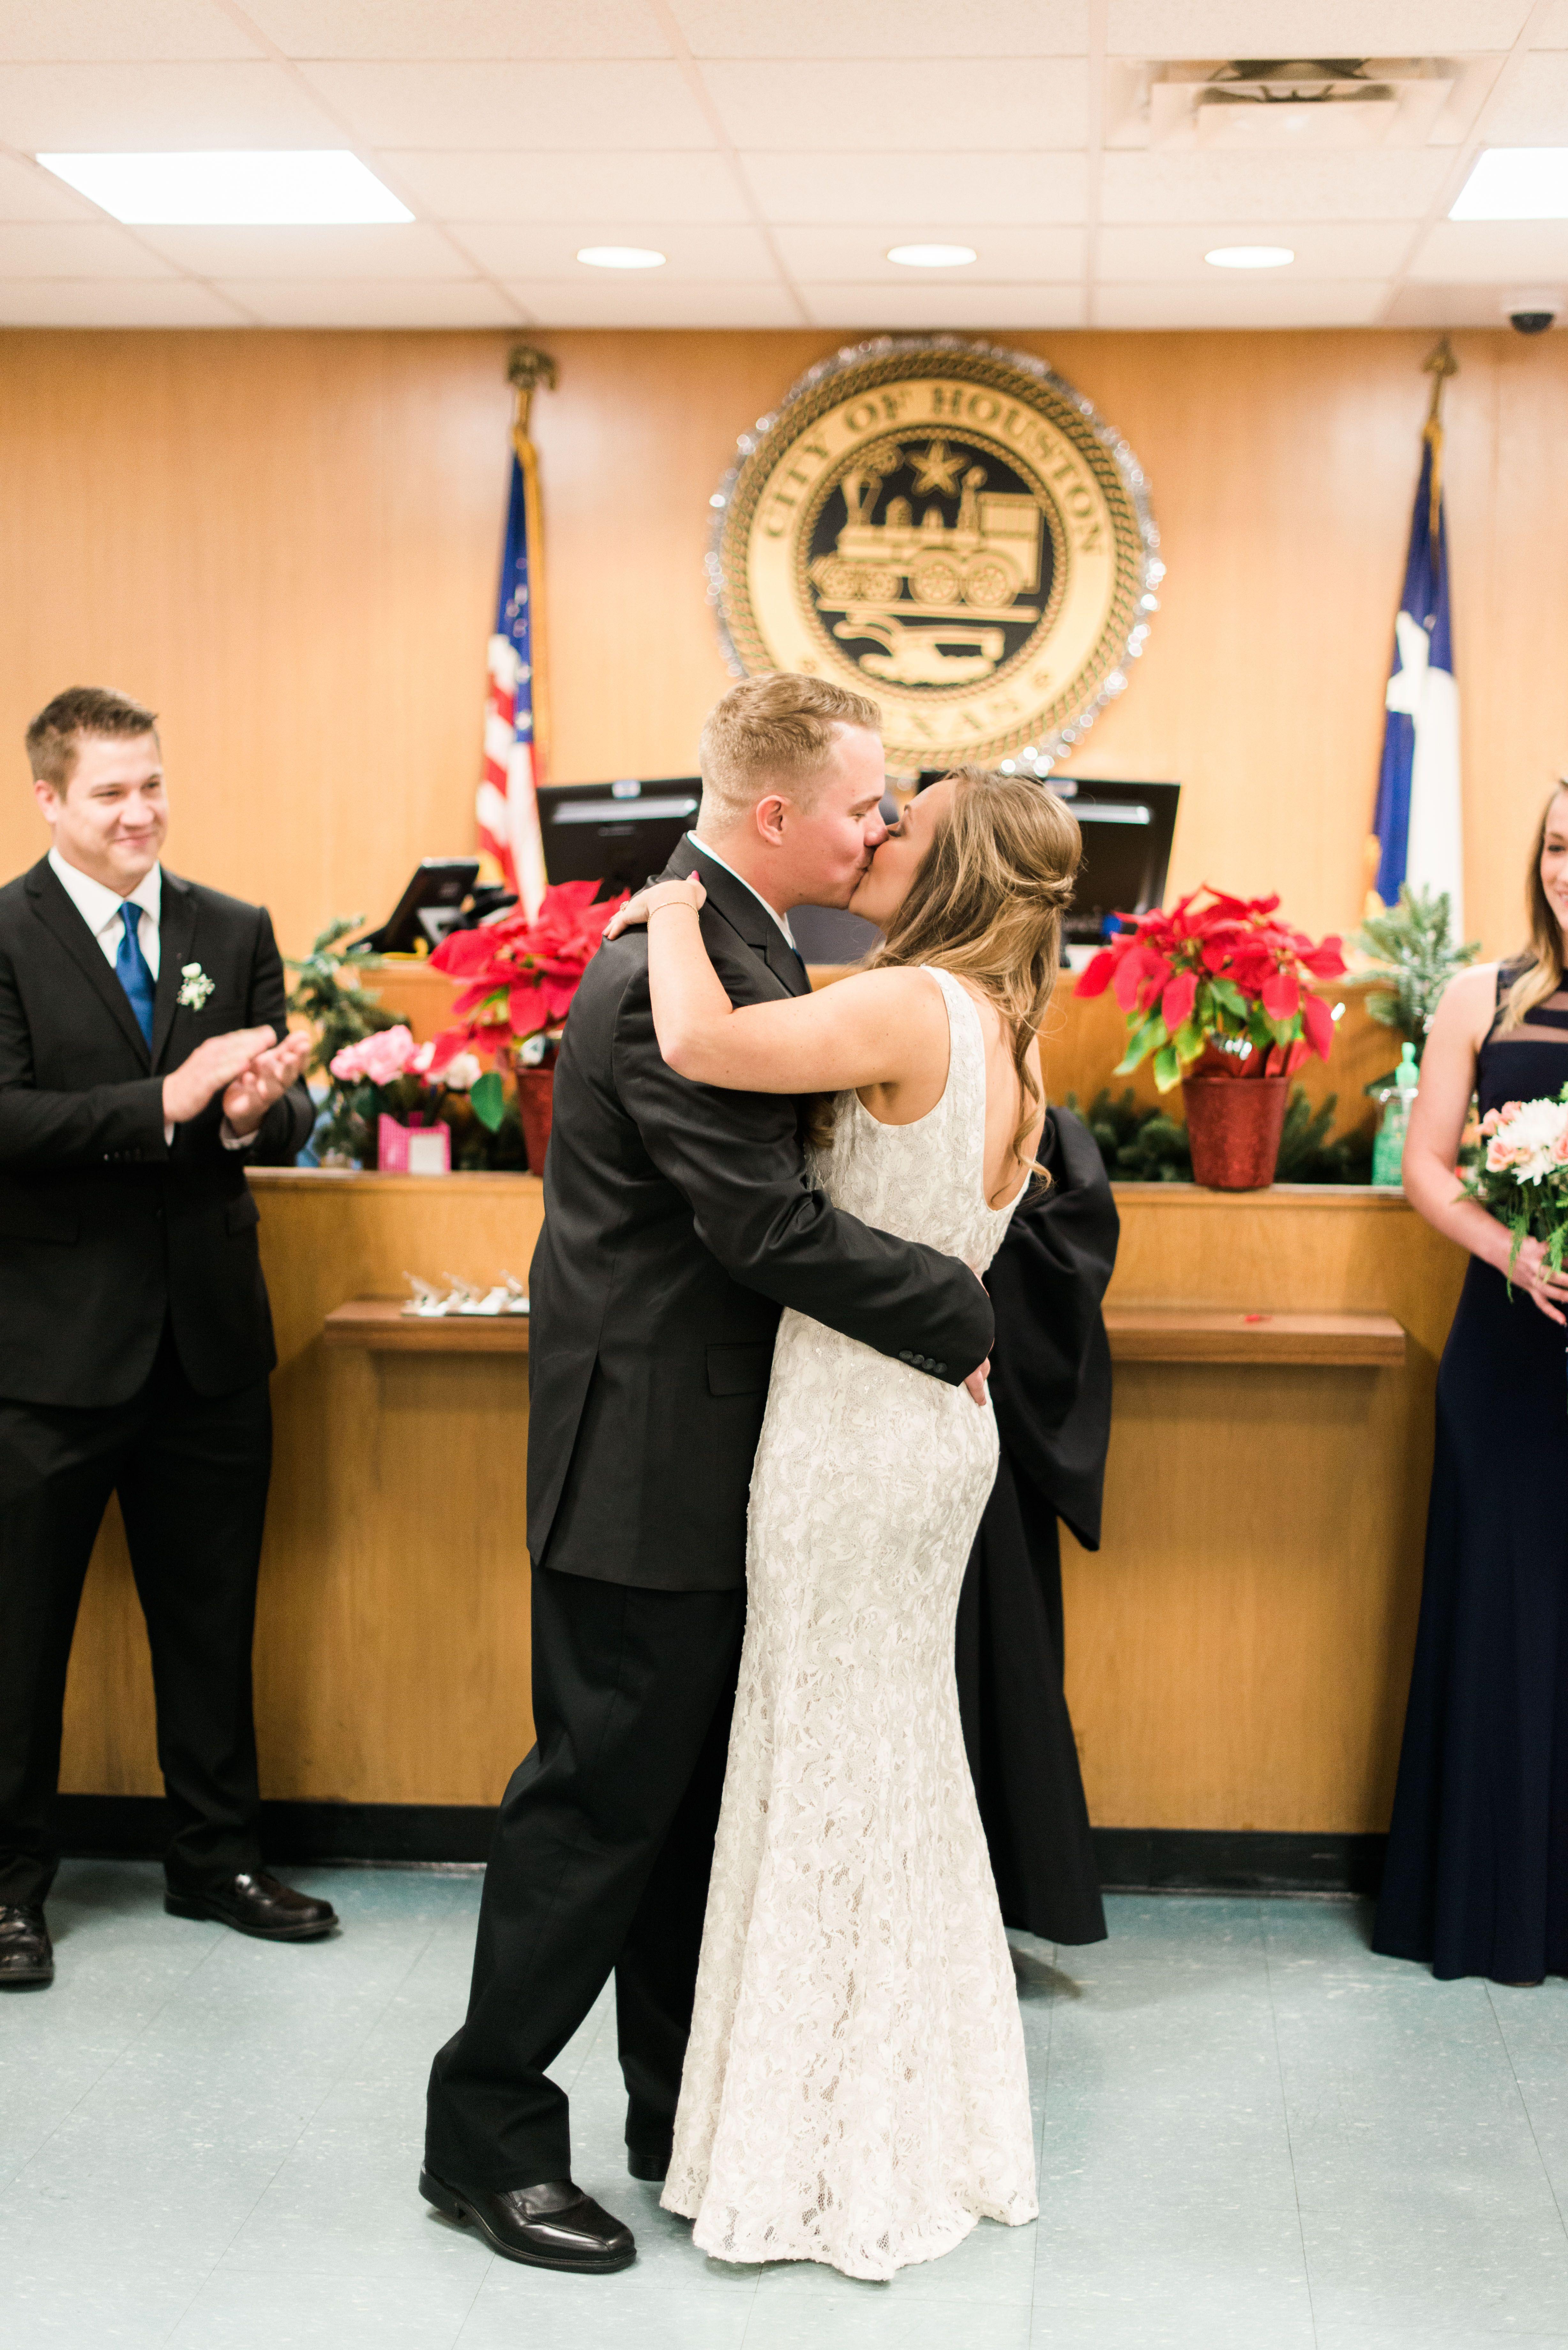 1400 Lubbock Street Houston Tx Courthouse Wedding No Stress Low Budget Photos Courtney Leigh Photography Www Courtneyleighphoto